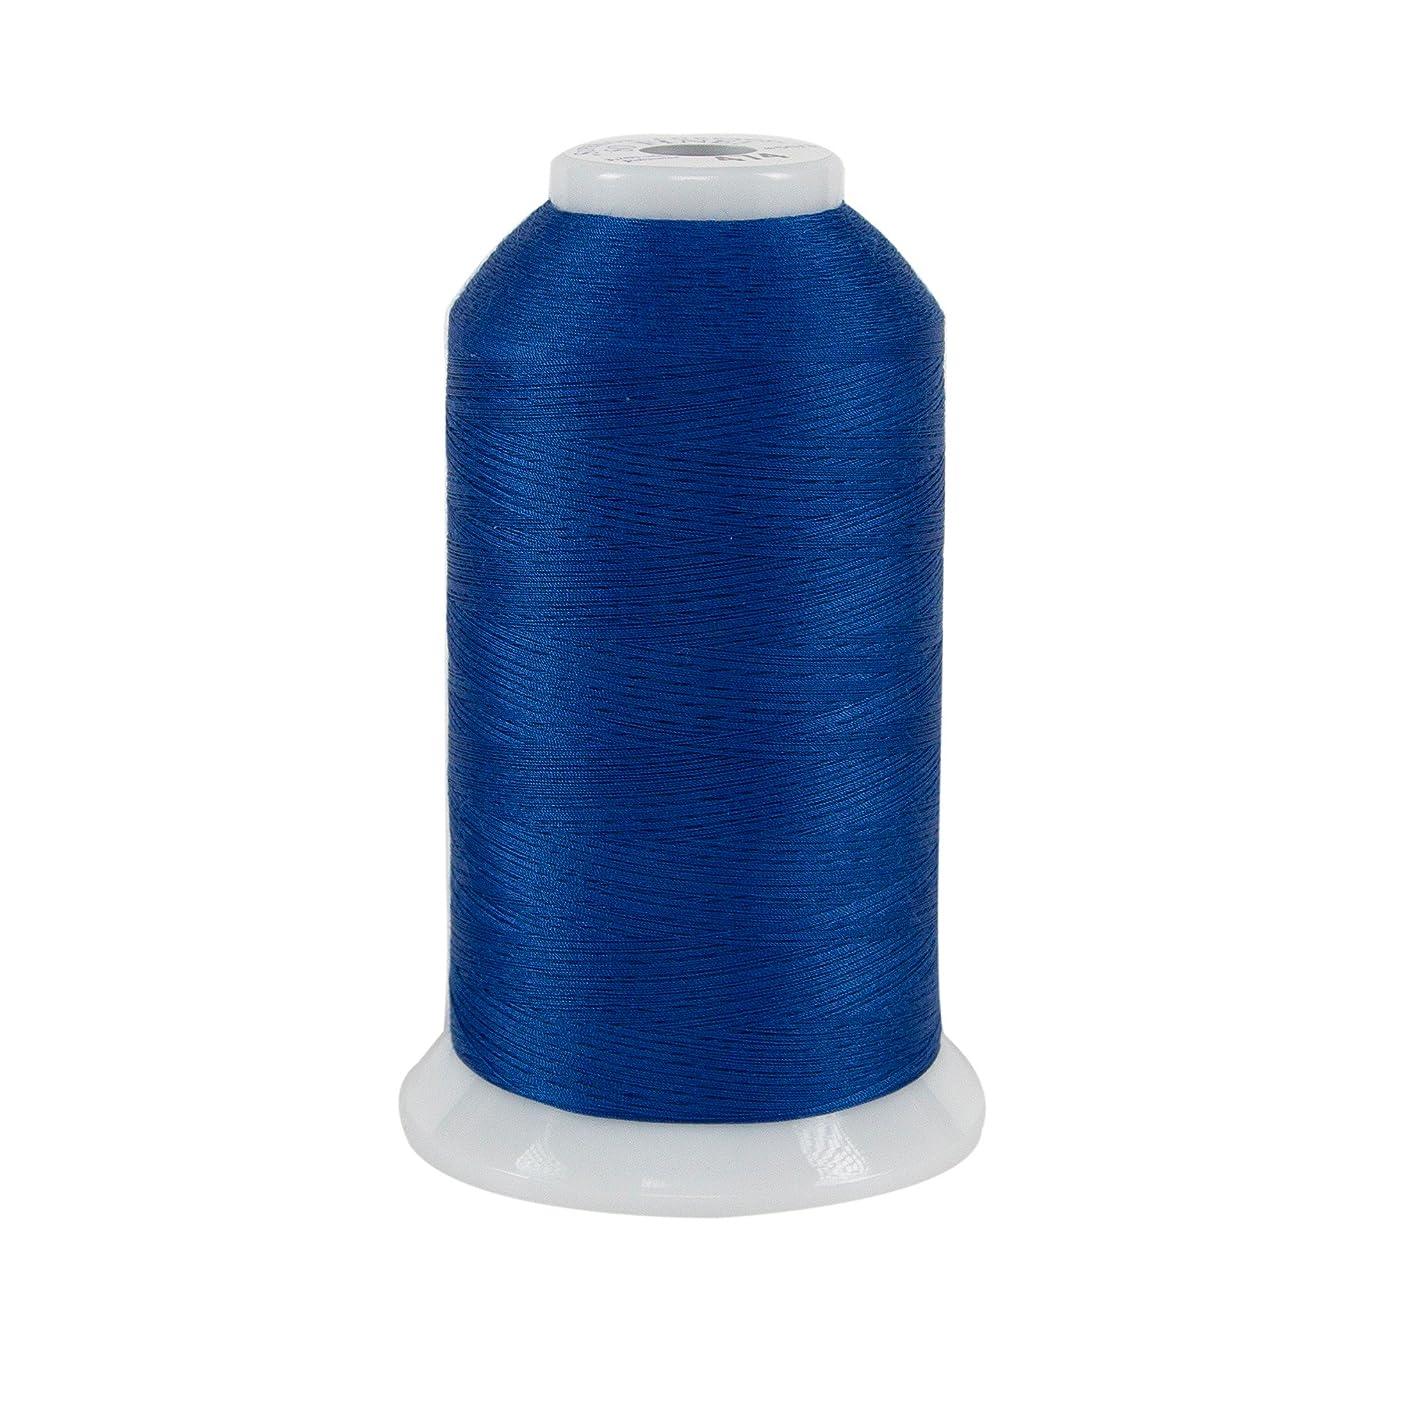 Superior Threads 11602-474 So Fine Billings Blue 3-Ply 50W Polyester Thread, 3280 yd